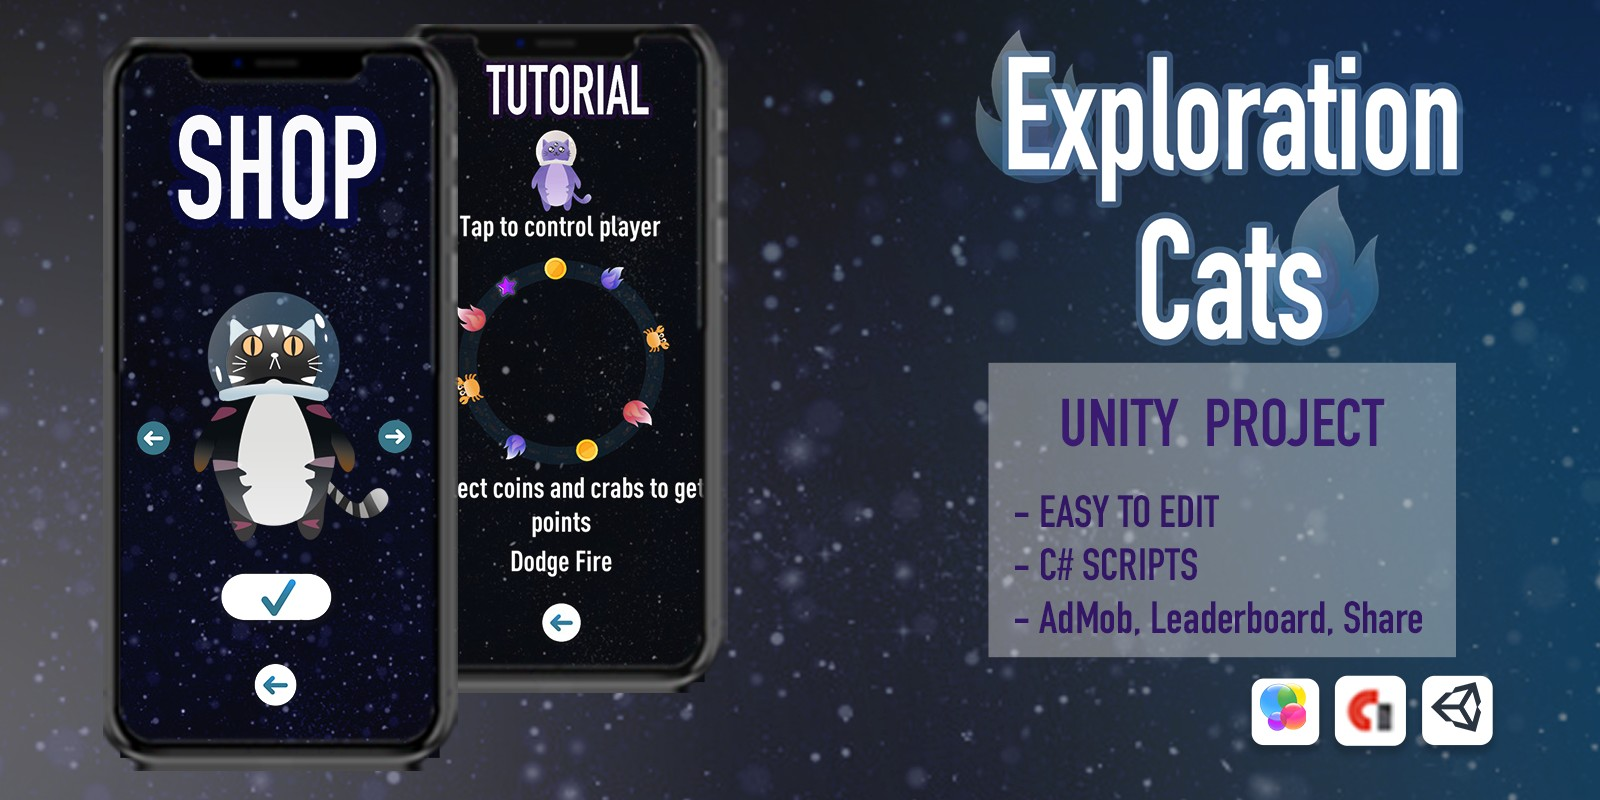 Exploration Cats - iOS Source Code